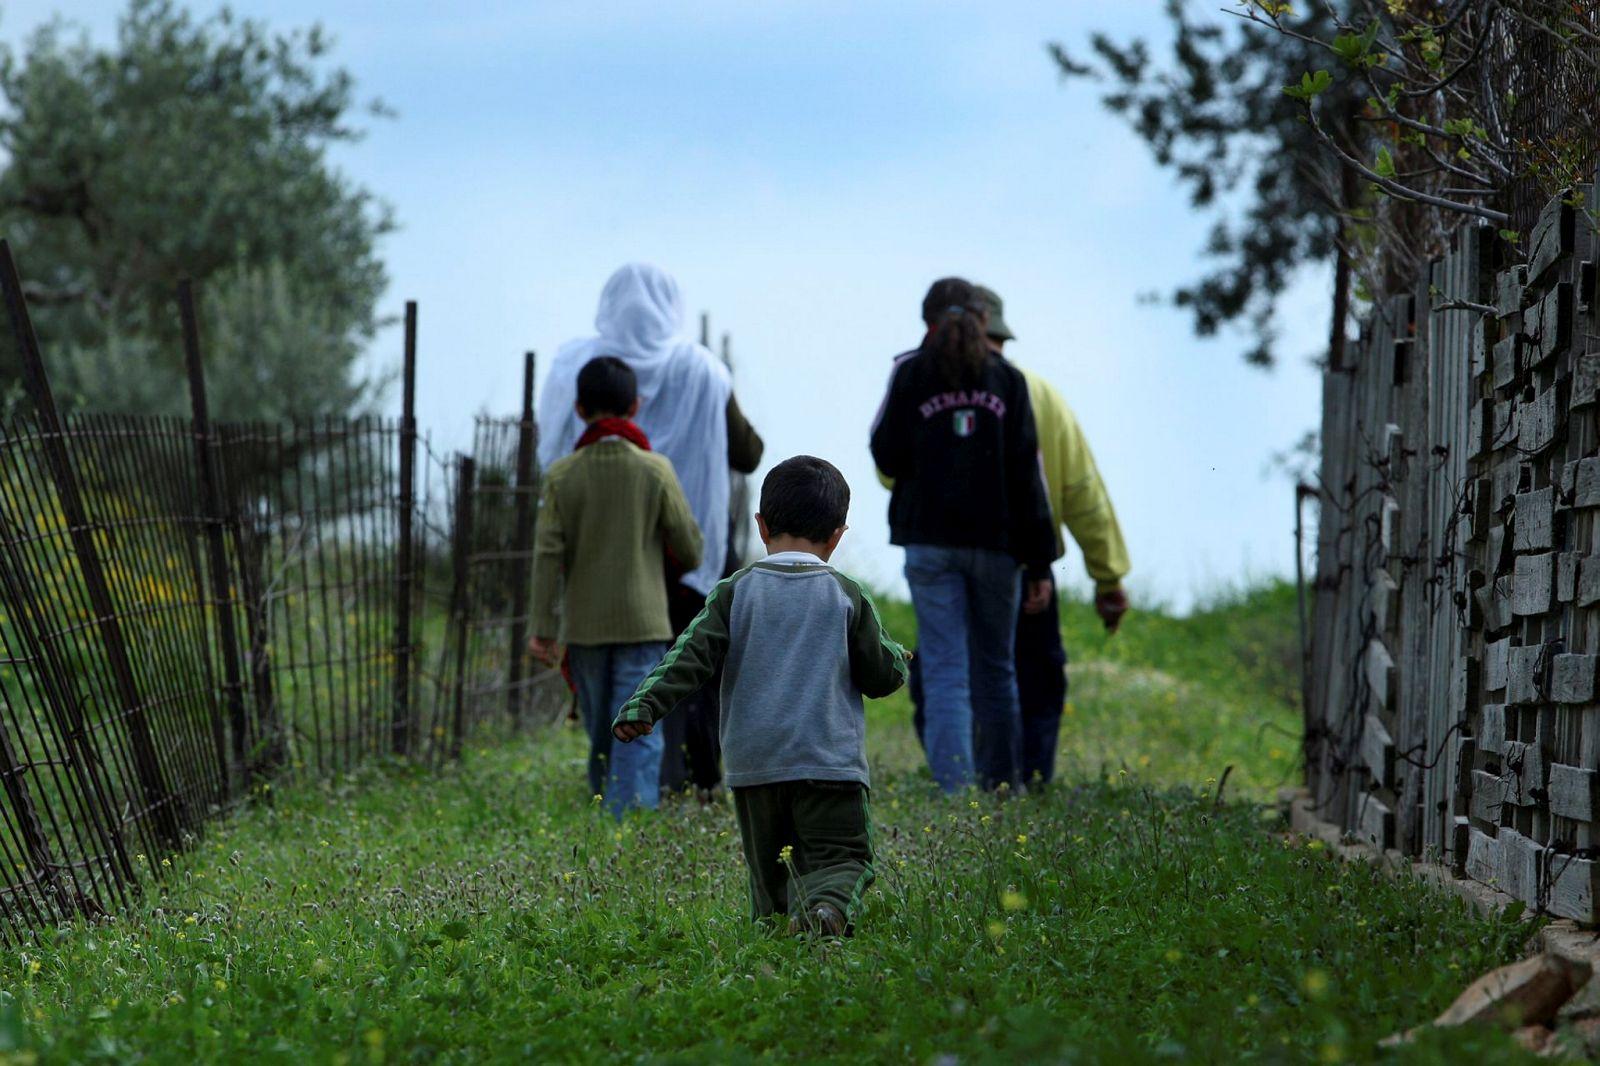 Druze Israelis walking in the Western Galilee. Photo by Moshe Shai/